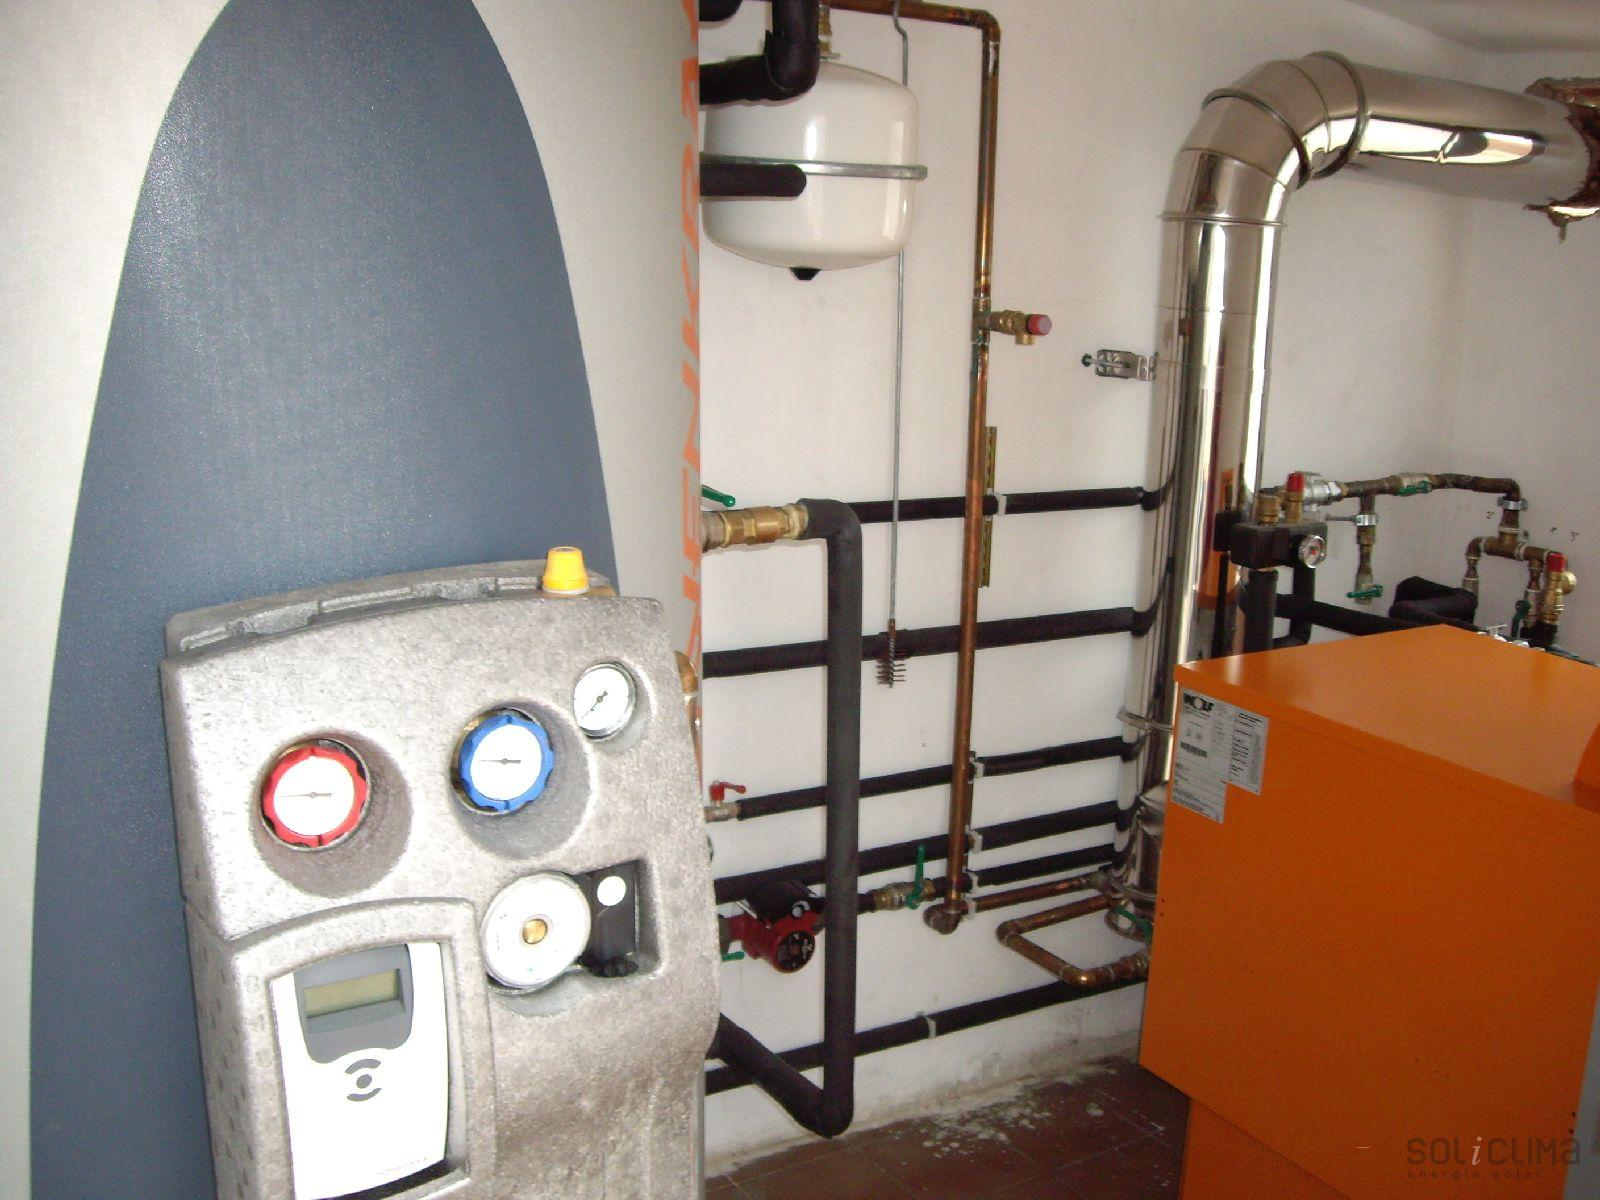 Energ a solar zaragoza - Caldera no calienta agua si calefaccion ...